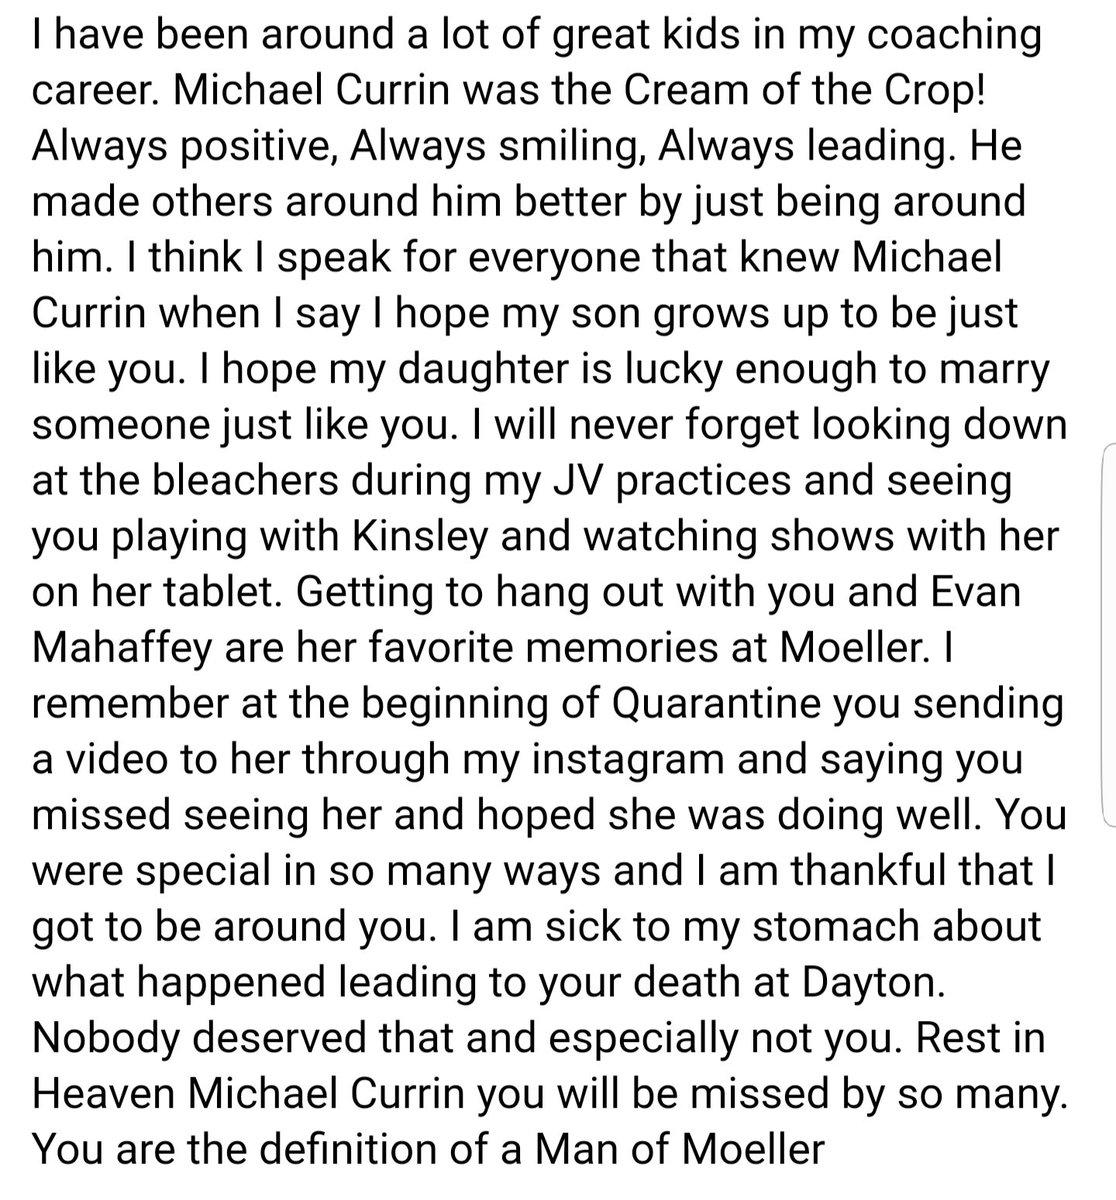 Rest in Heaven Michael Currin https://t.co/a4tDDOfzZD